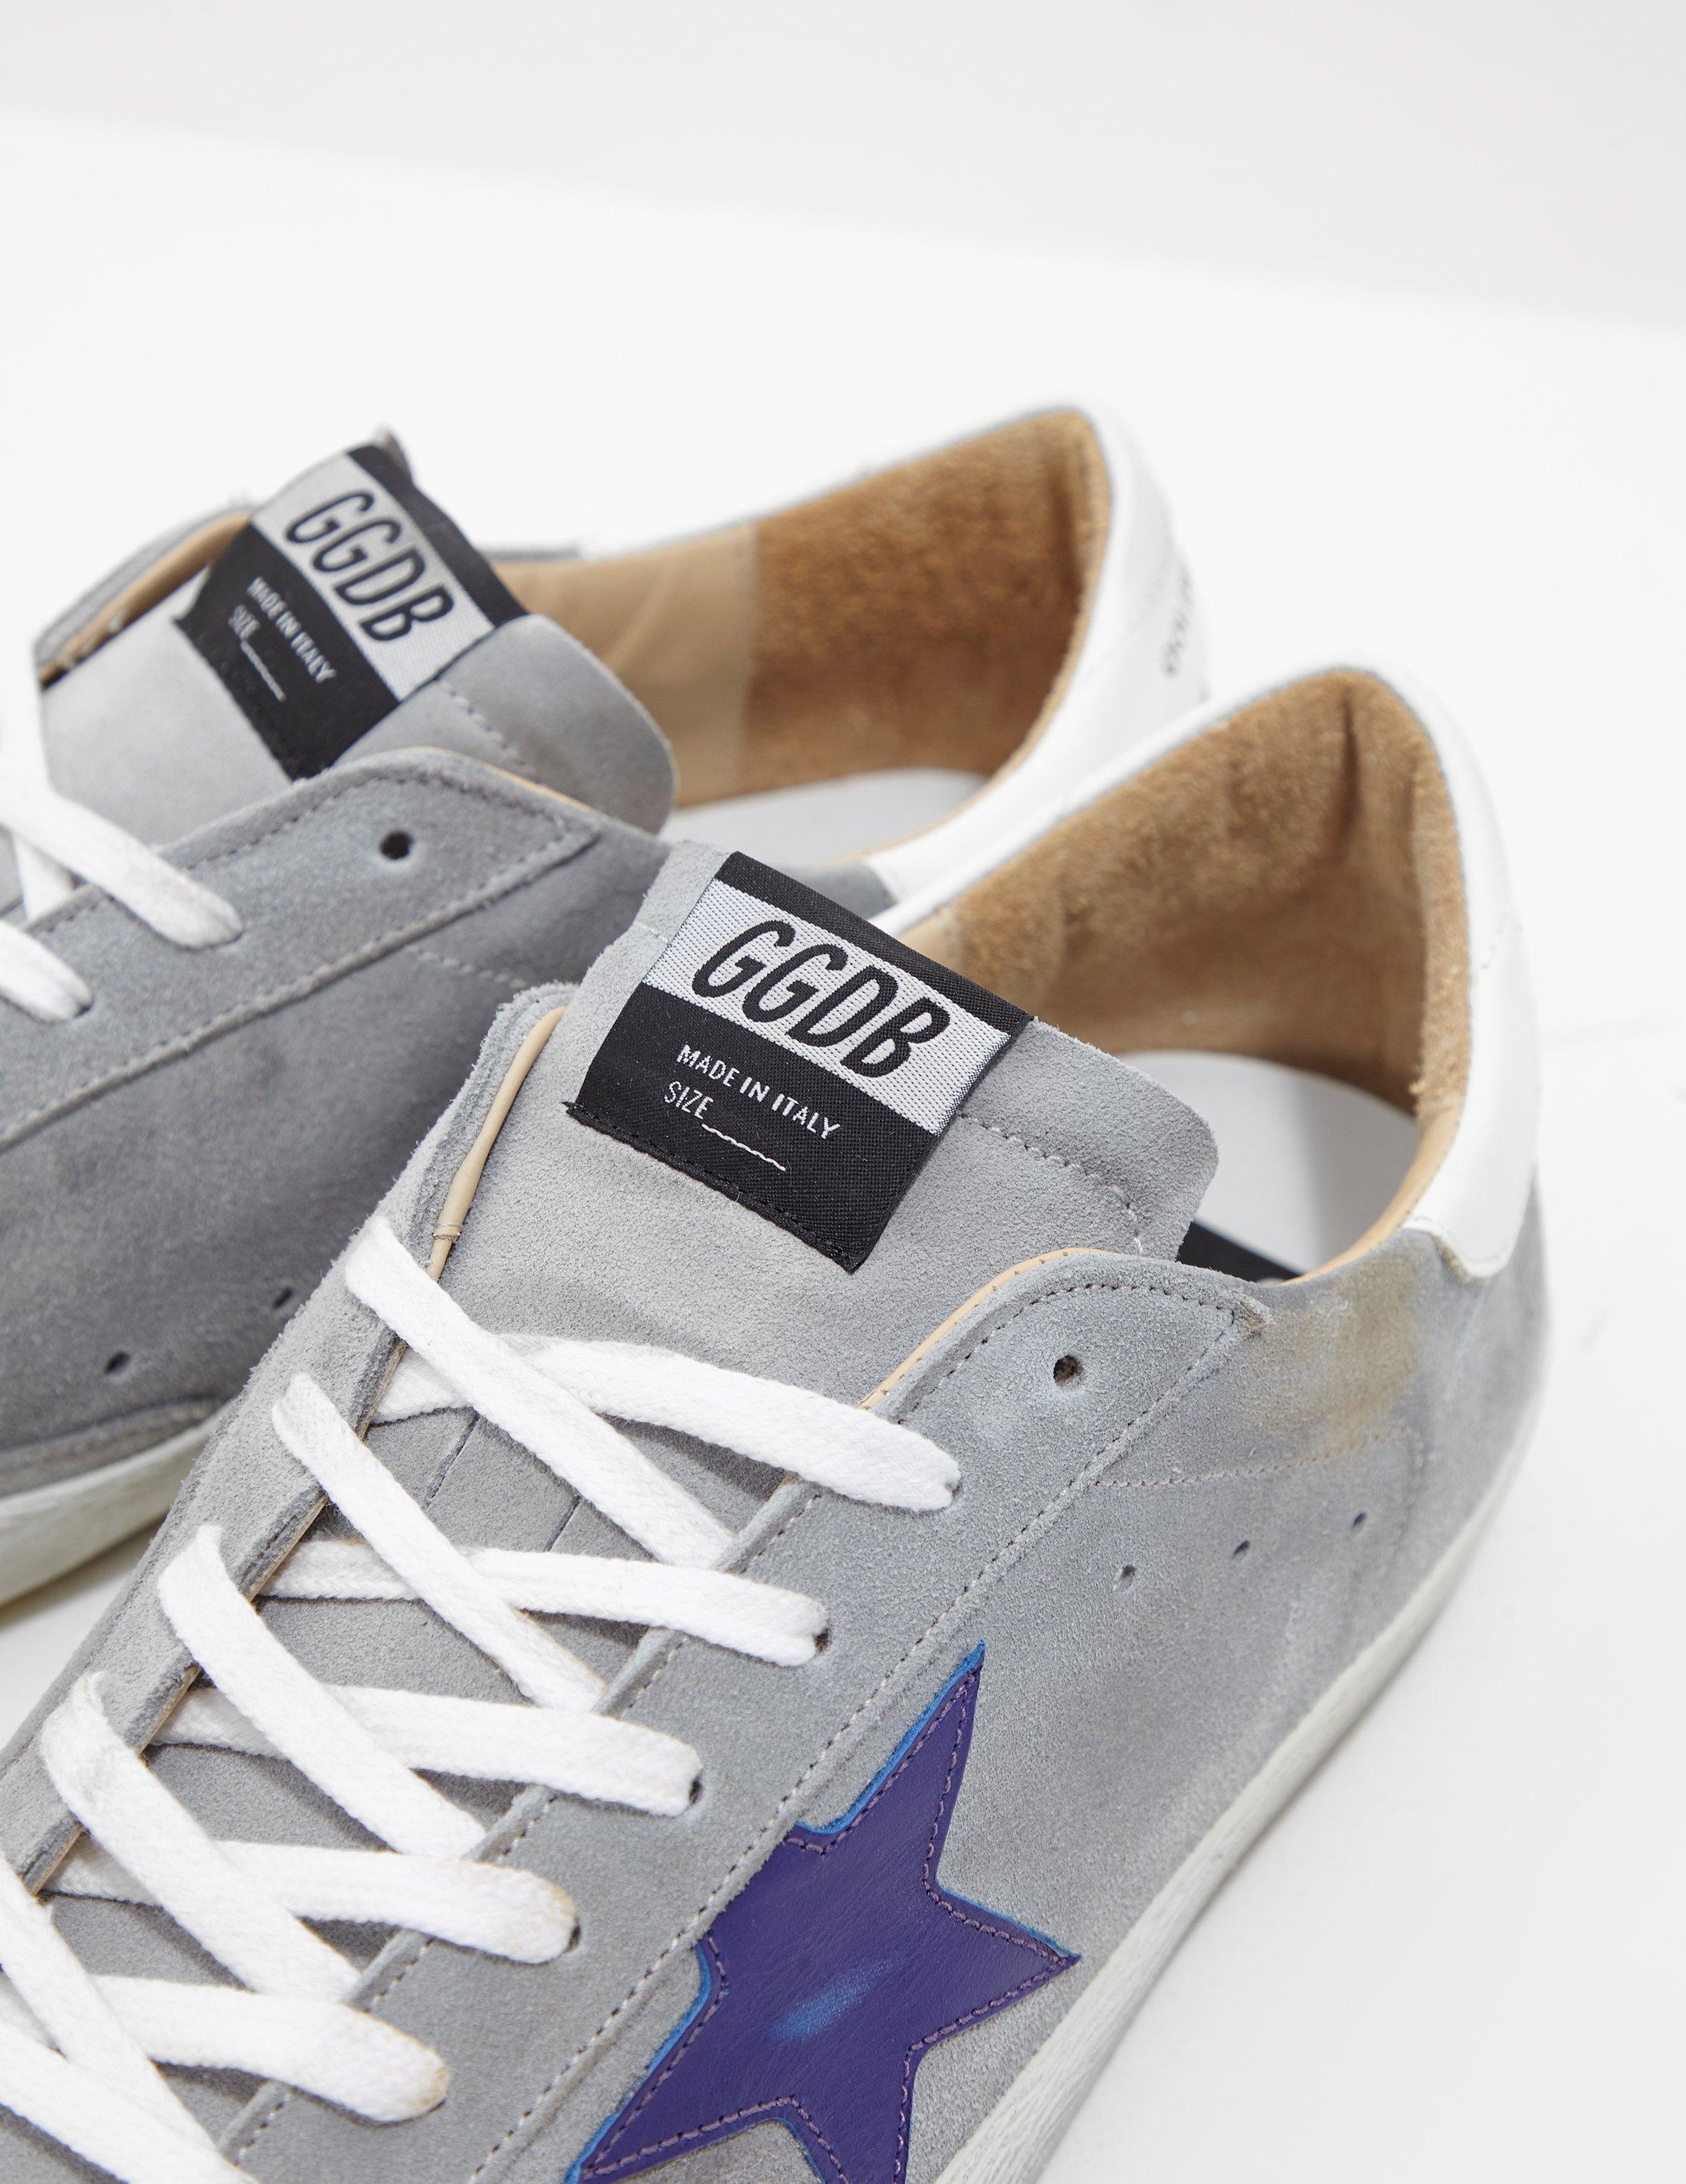 cbbe4c825306 Lyst - Golden Goose Deluxe Brand Mens Superstar Sneakers Blue in Blue for  Men